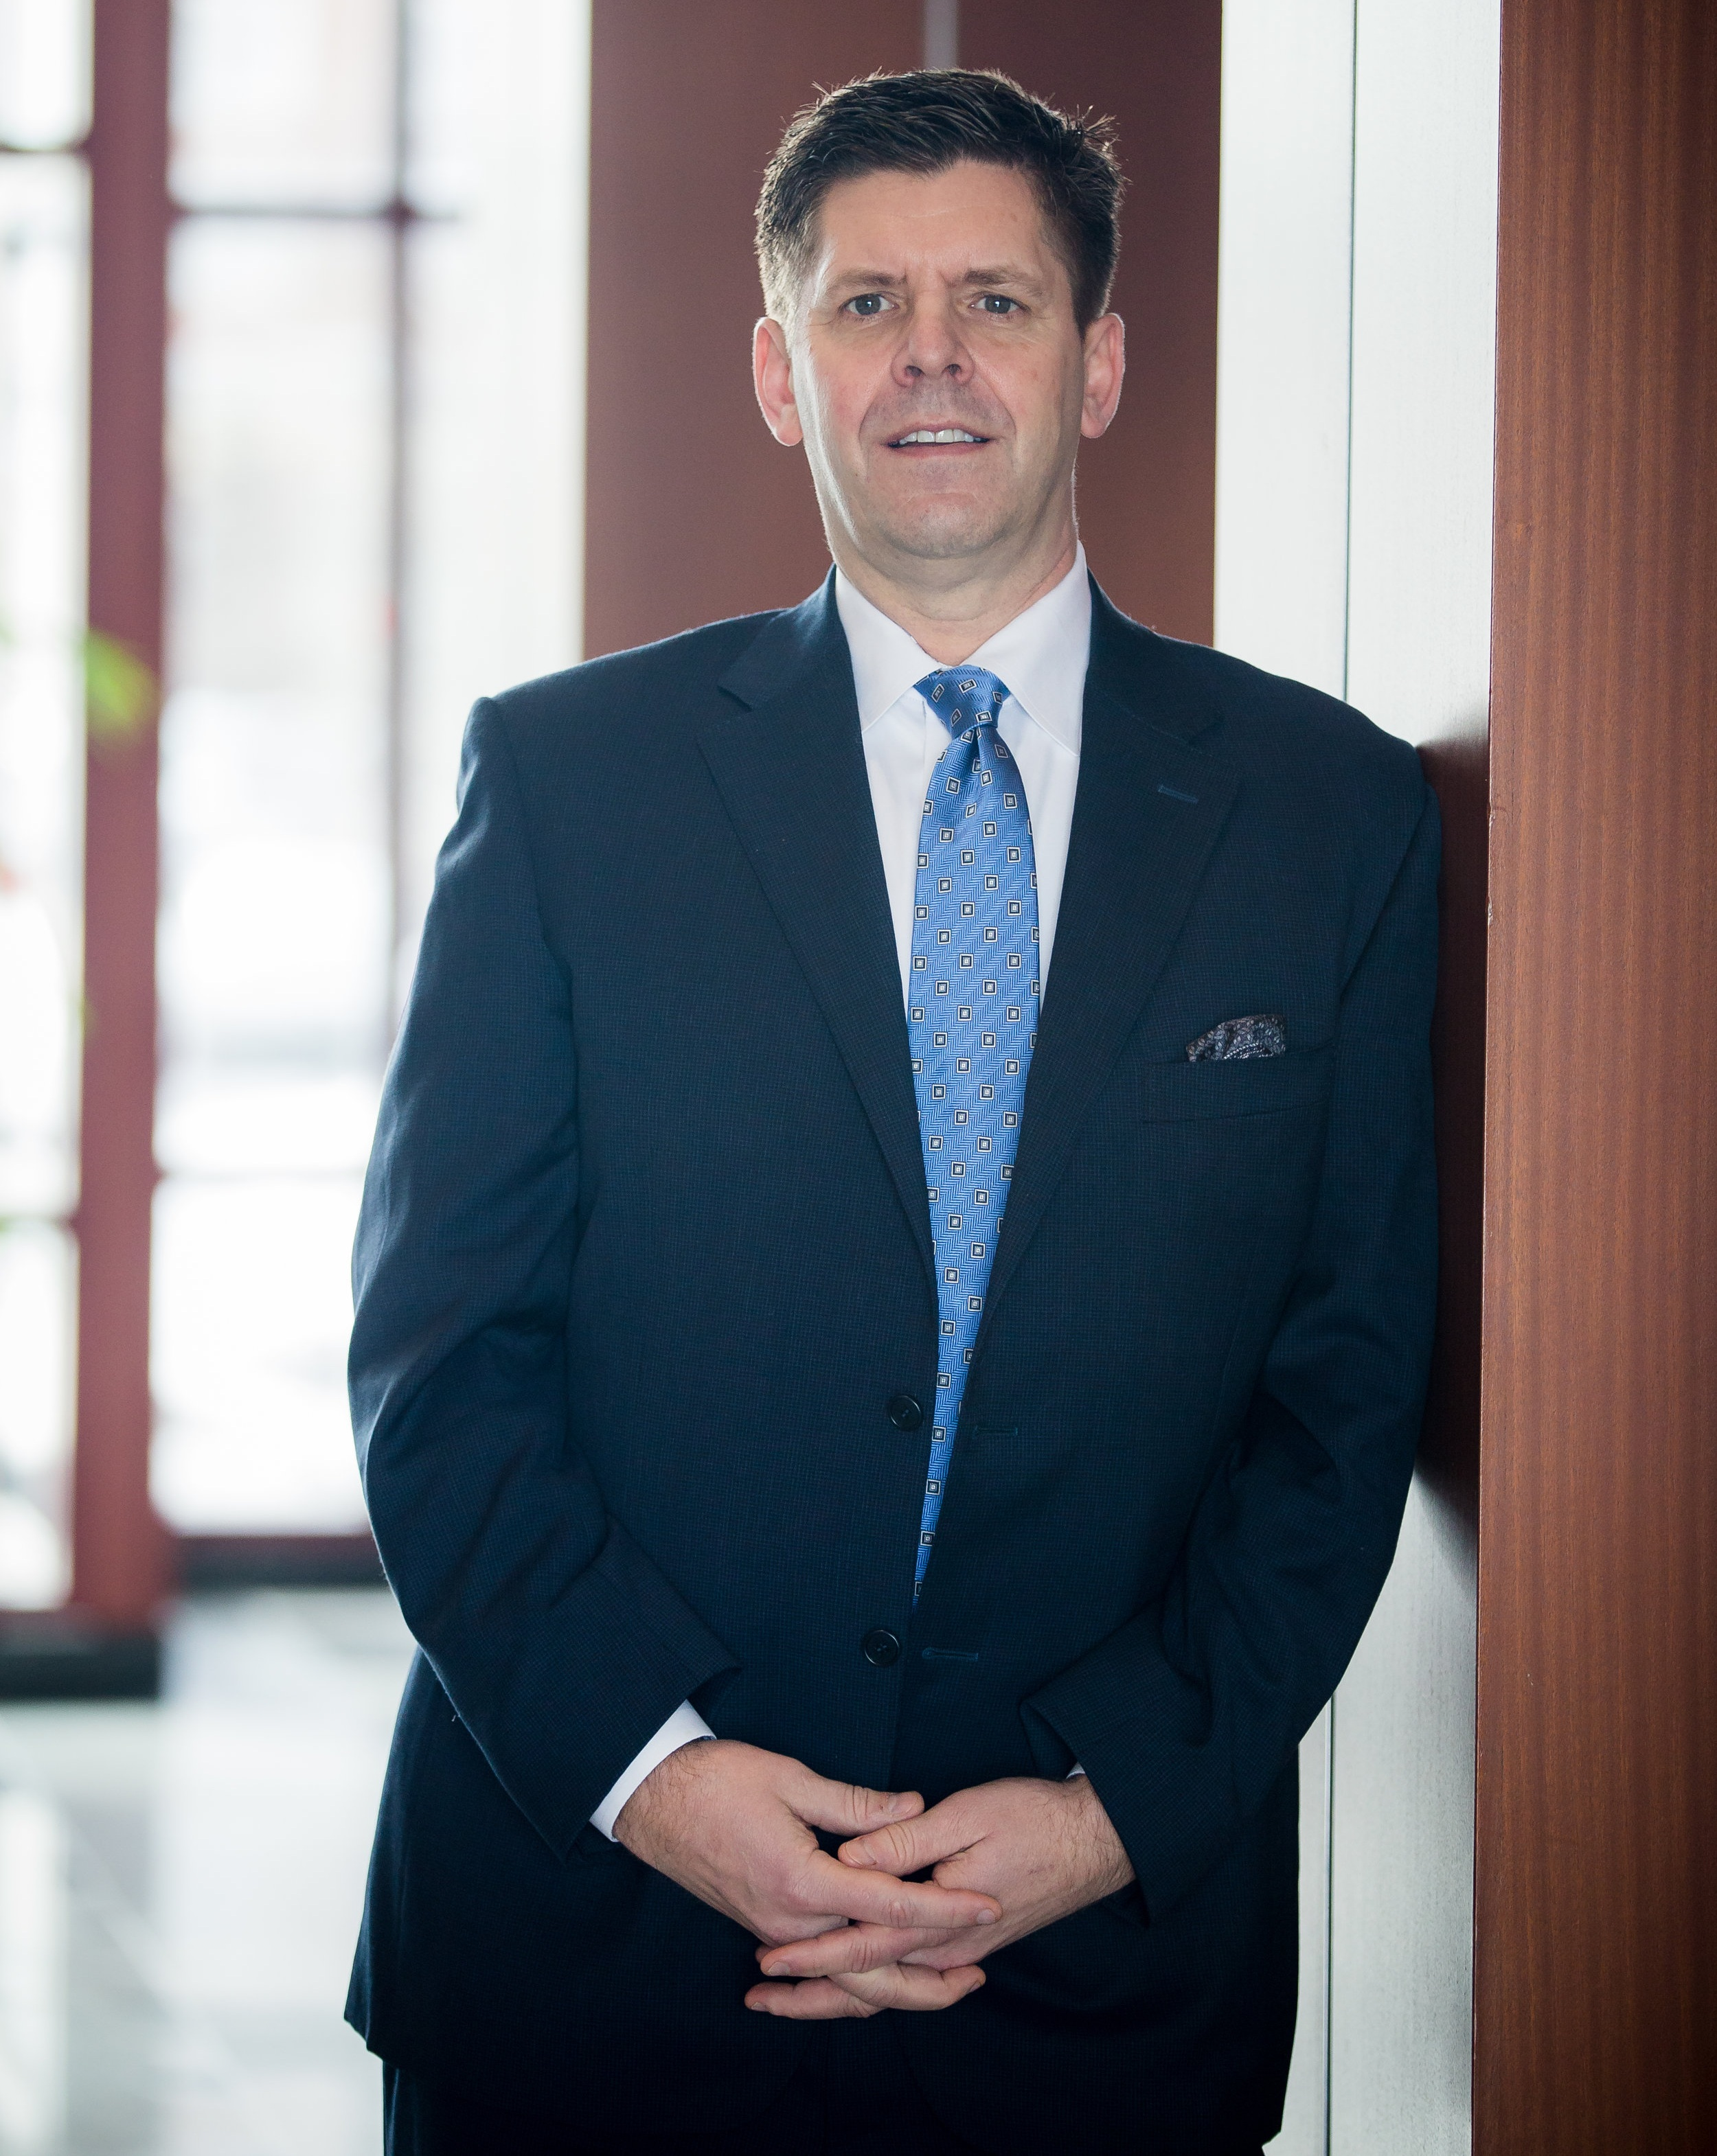 Brad+Wheeler+Managing+Director+of+Business+Development